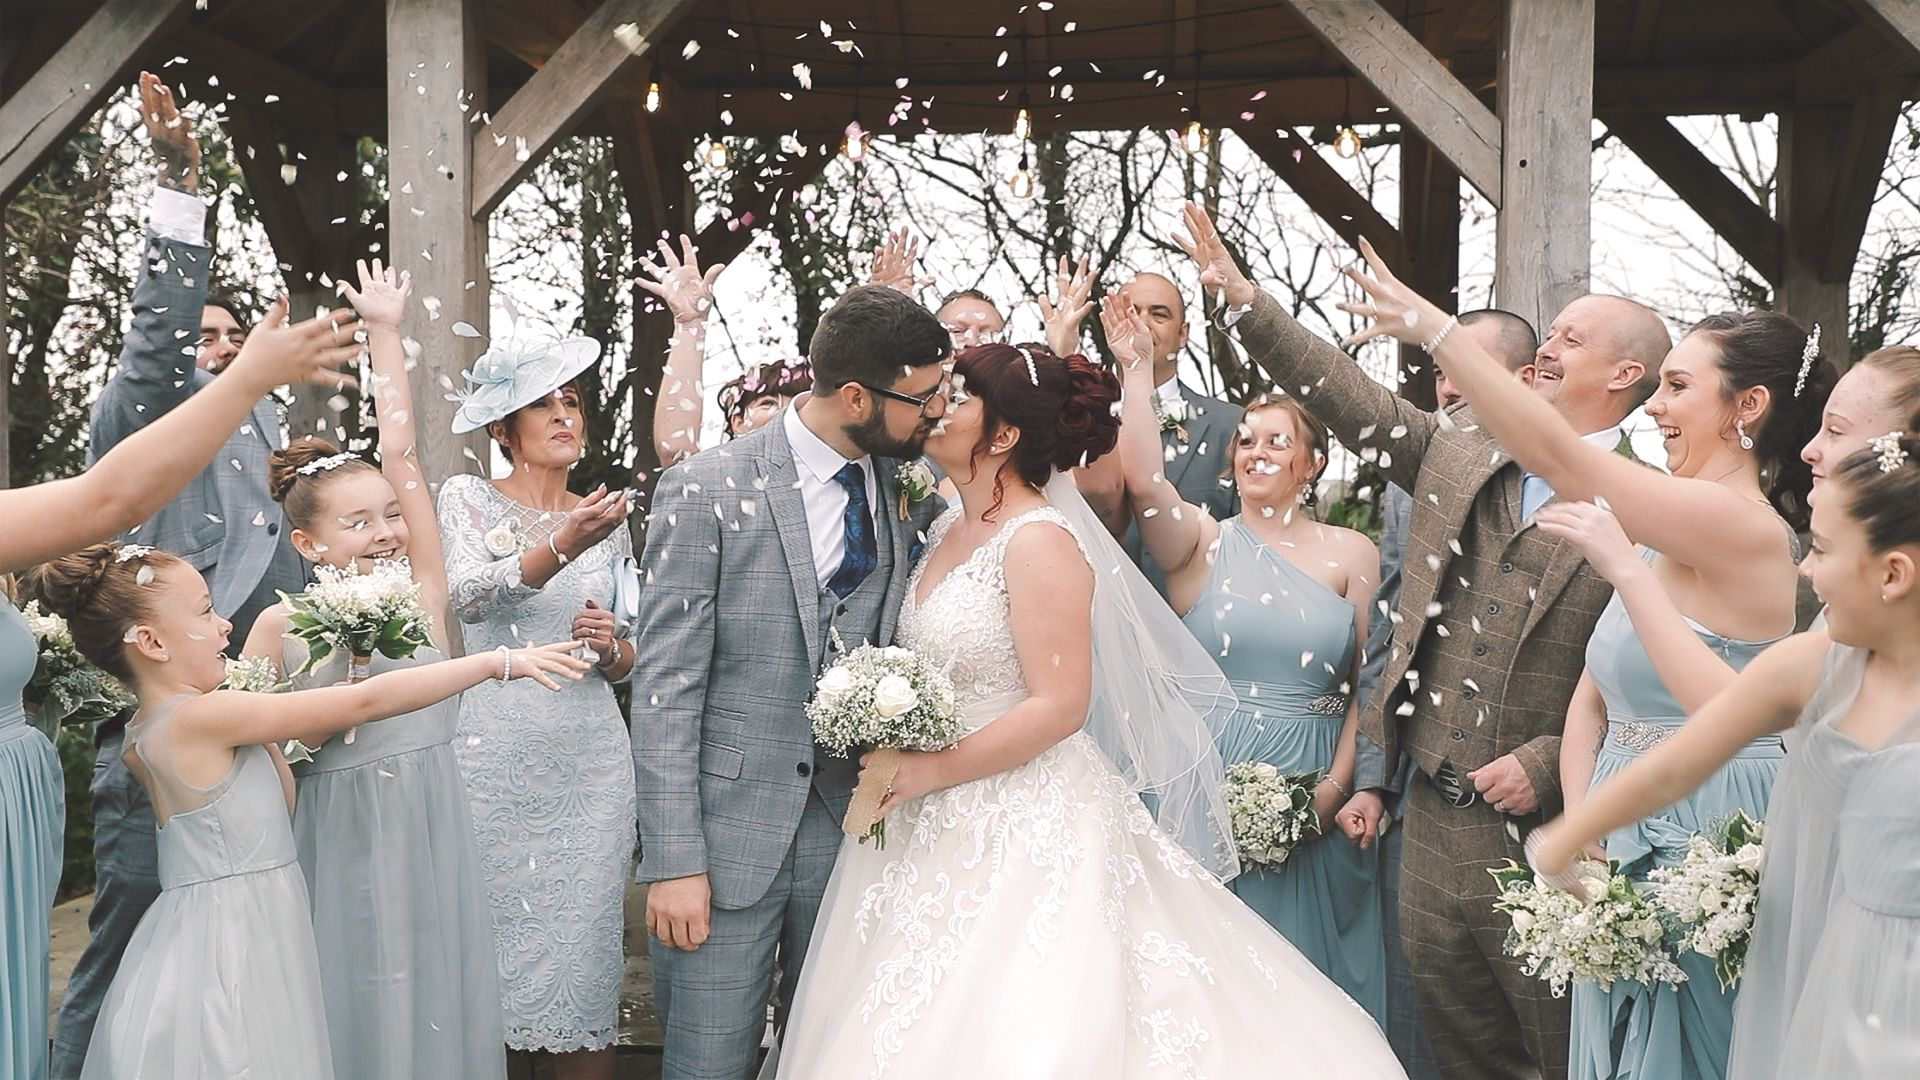 Bride and Groom confetti Throw, Trevenna Barns